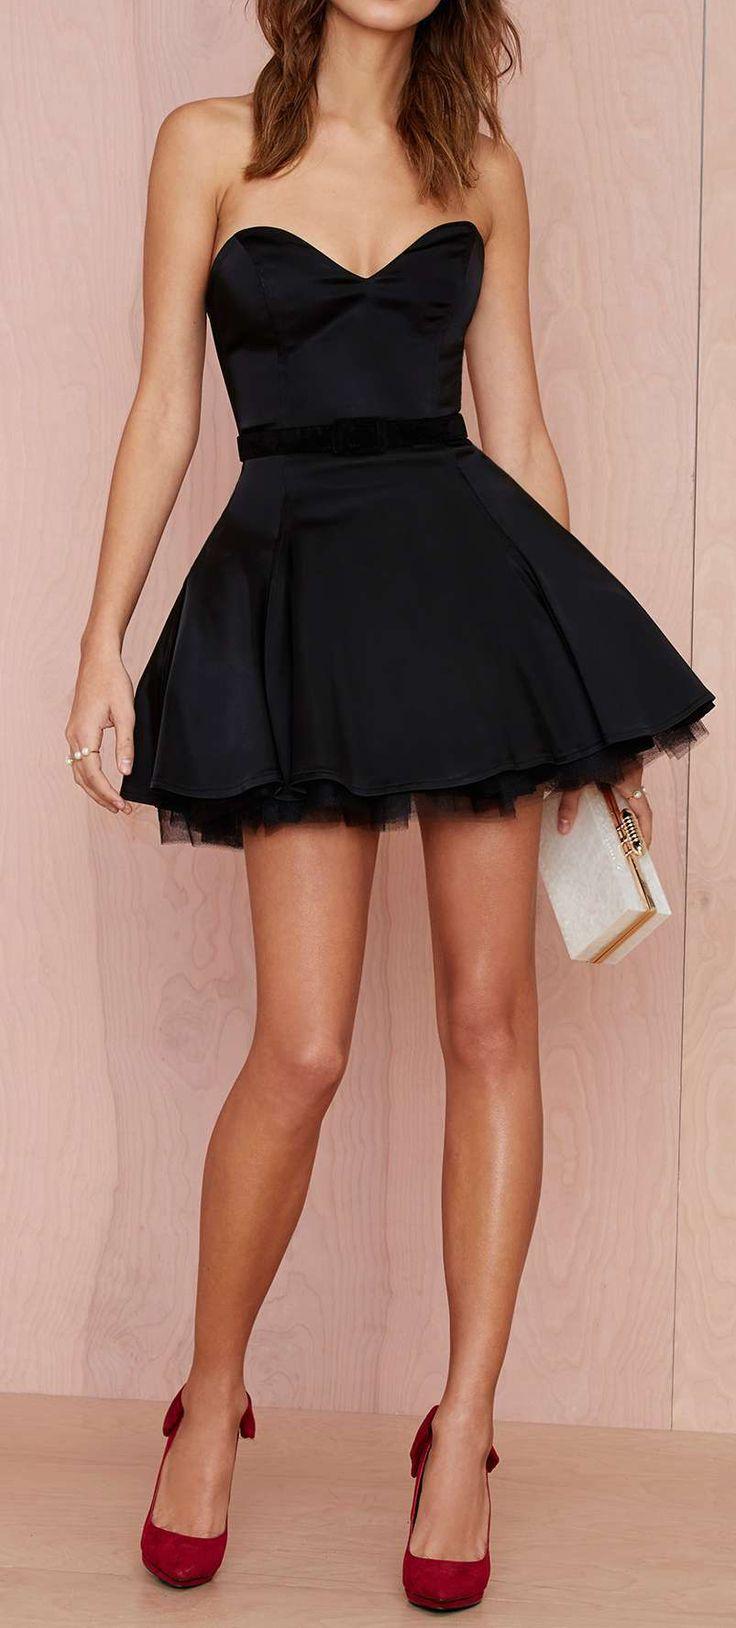 Sweetheart fit & flare dress